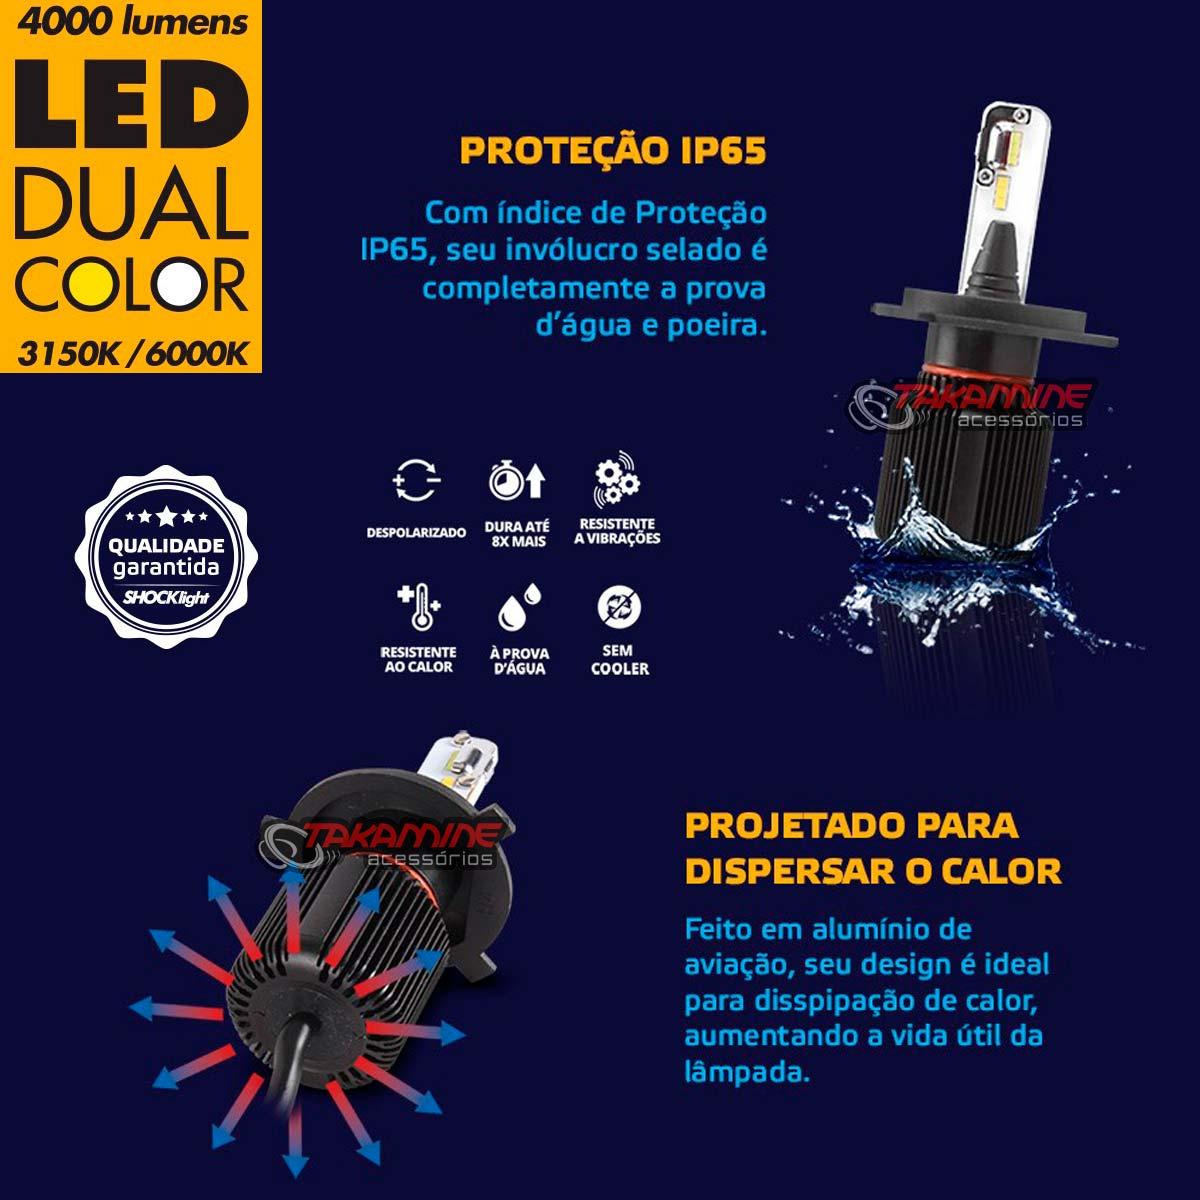 Kit de lâmpadas LED Dual Color Headlight Shocklight  tipo xenon H11 25W ilumina branco e amarelo